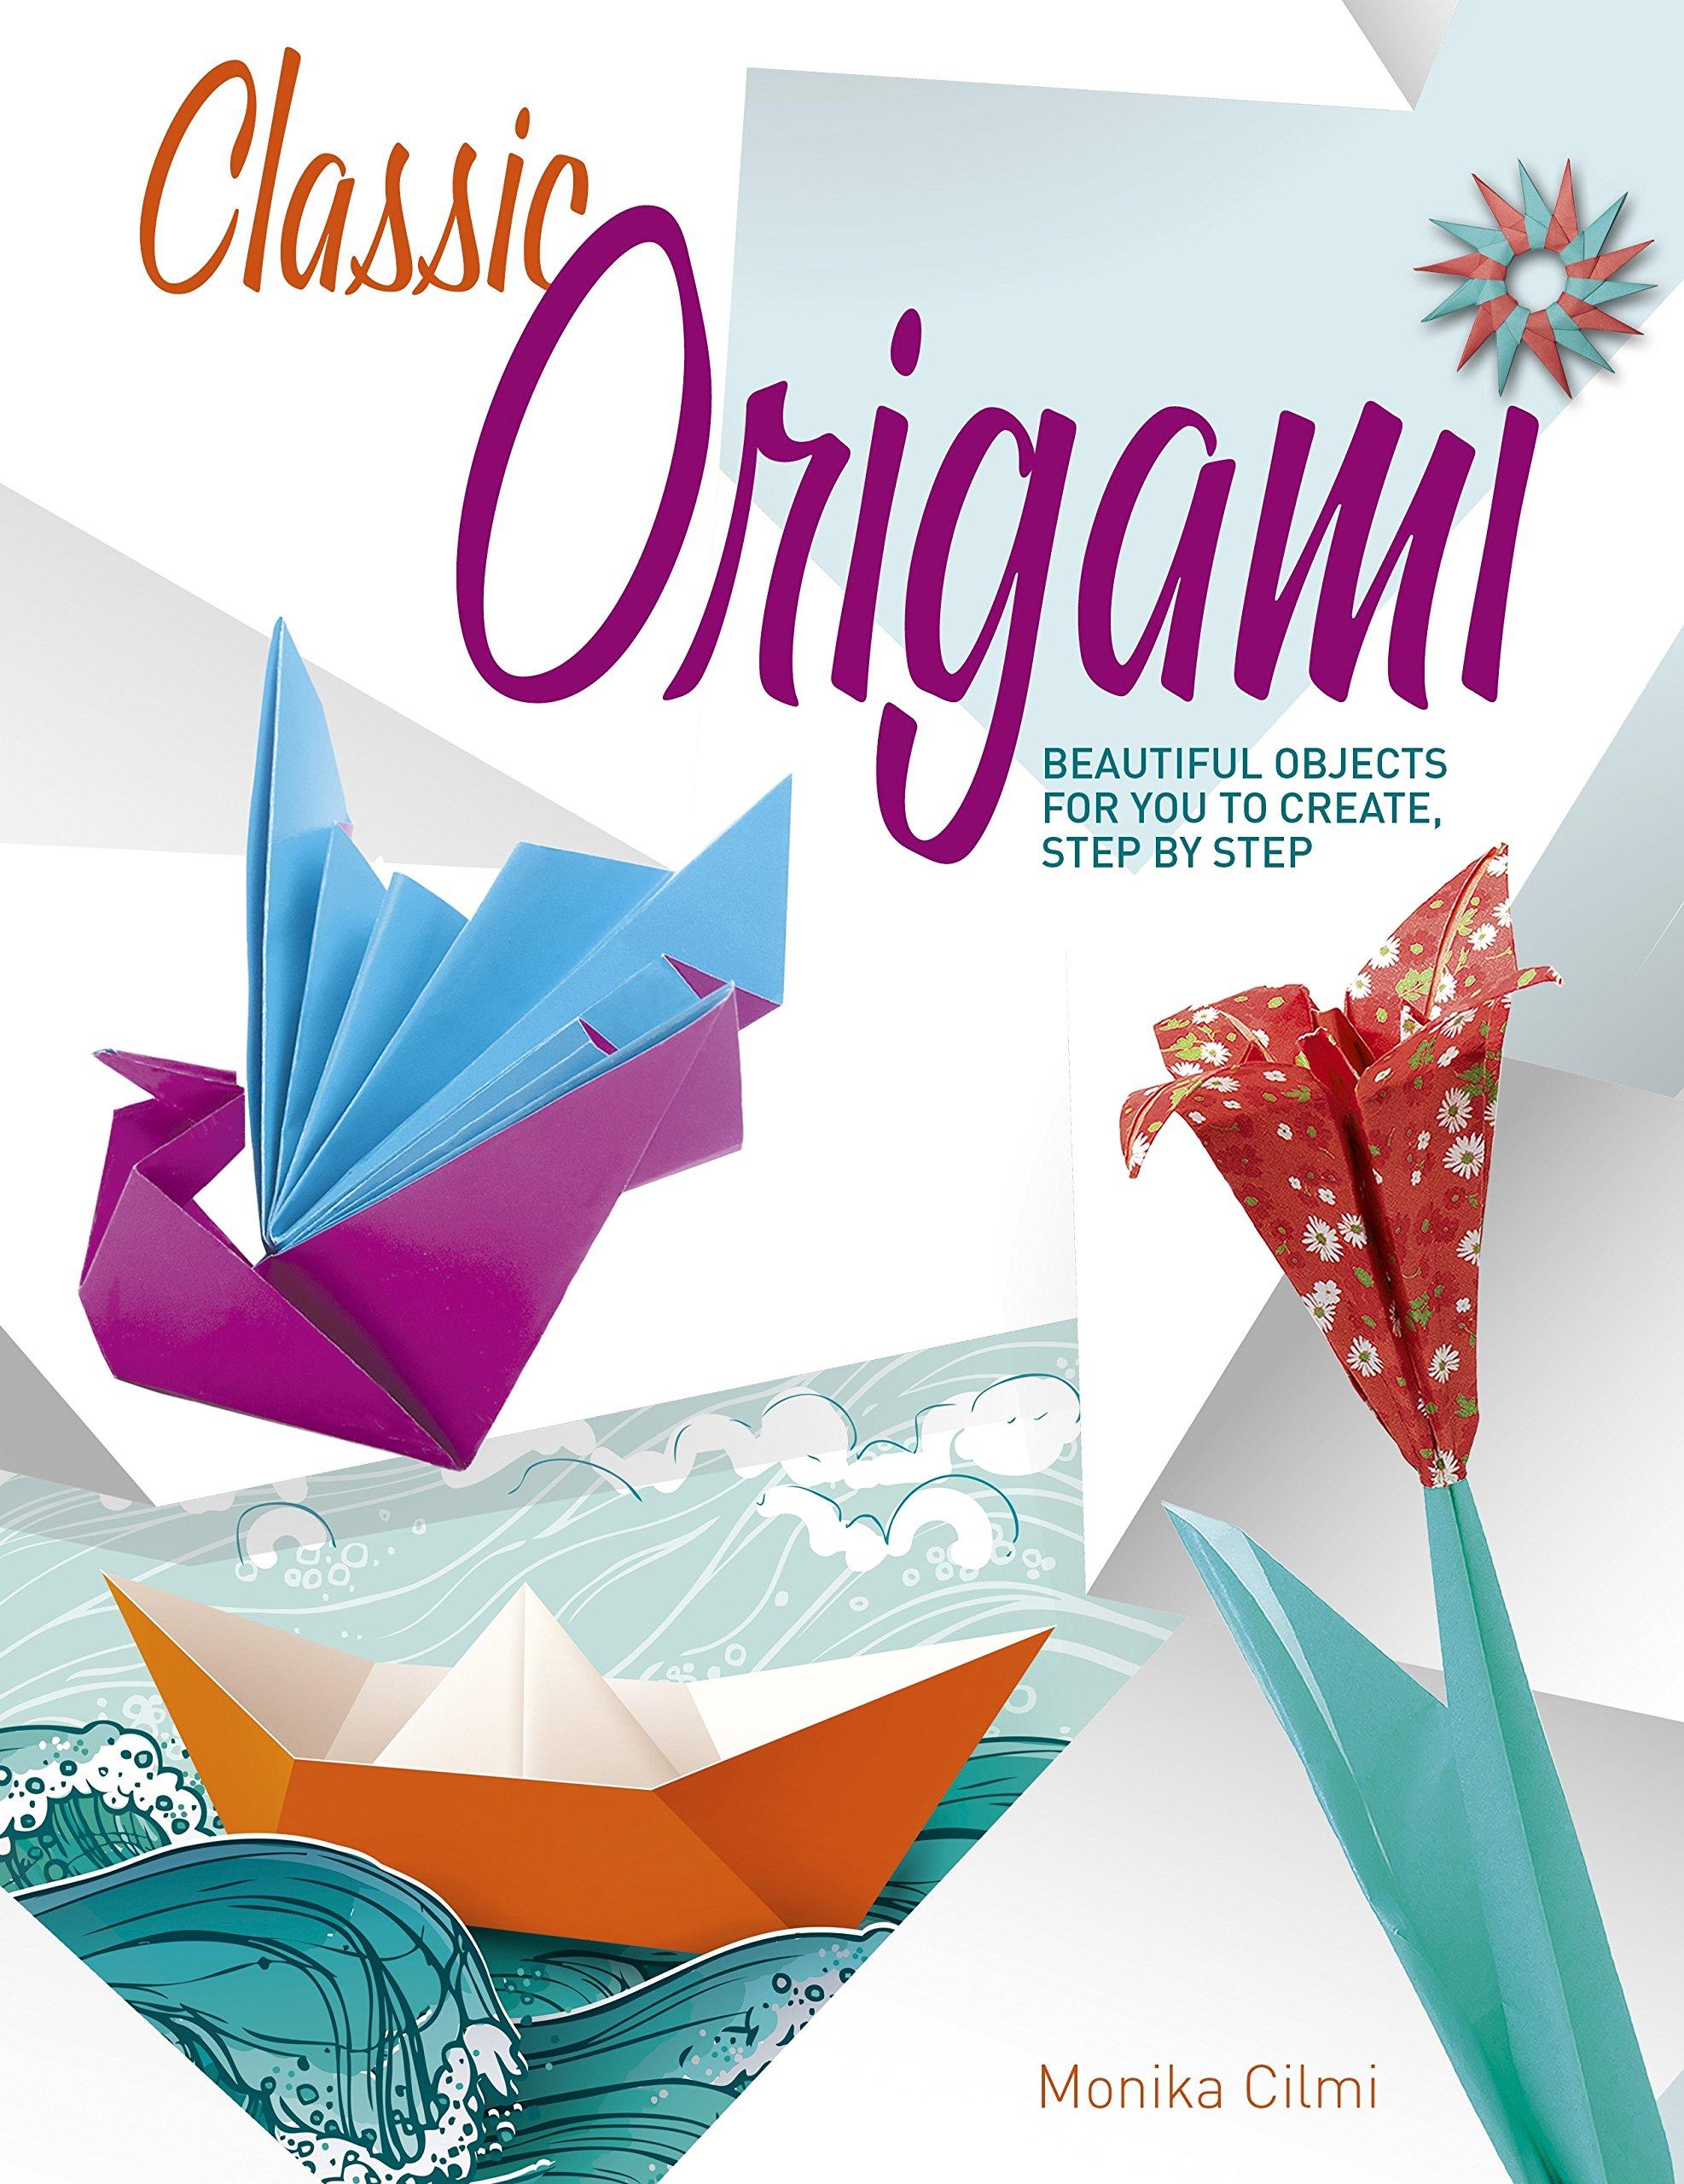 Classic origami beautiful objects for you to create step by step classic origami beautiful objects for you to create step by step monika cilmi 9781784282530 amazon books jeuxipadfo Choice Image